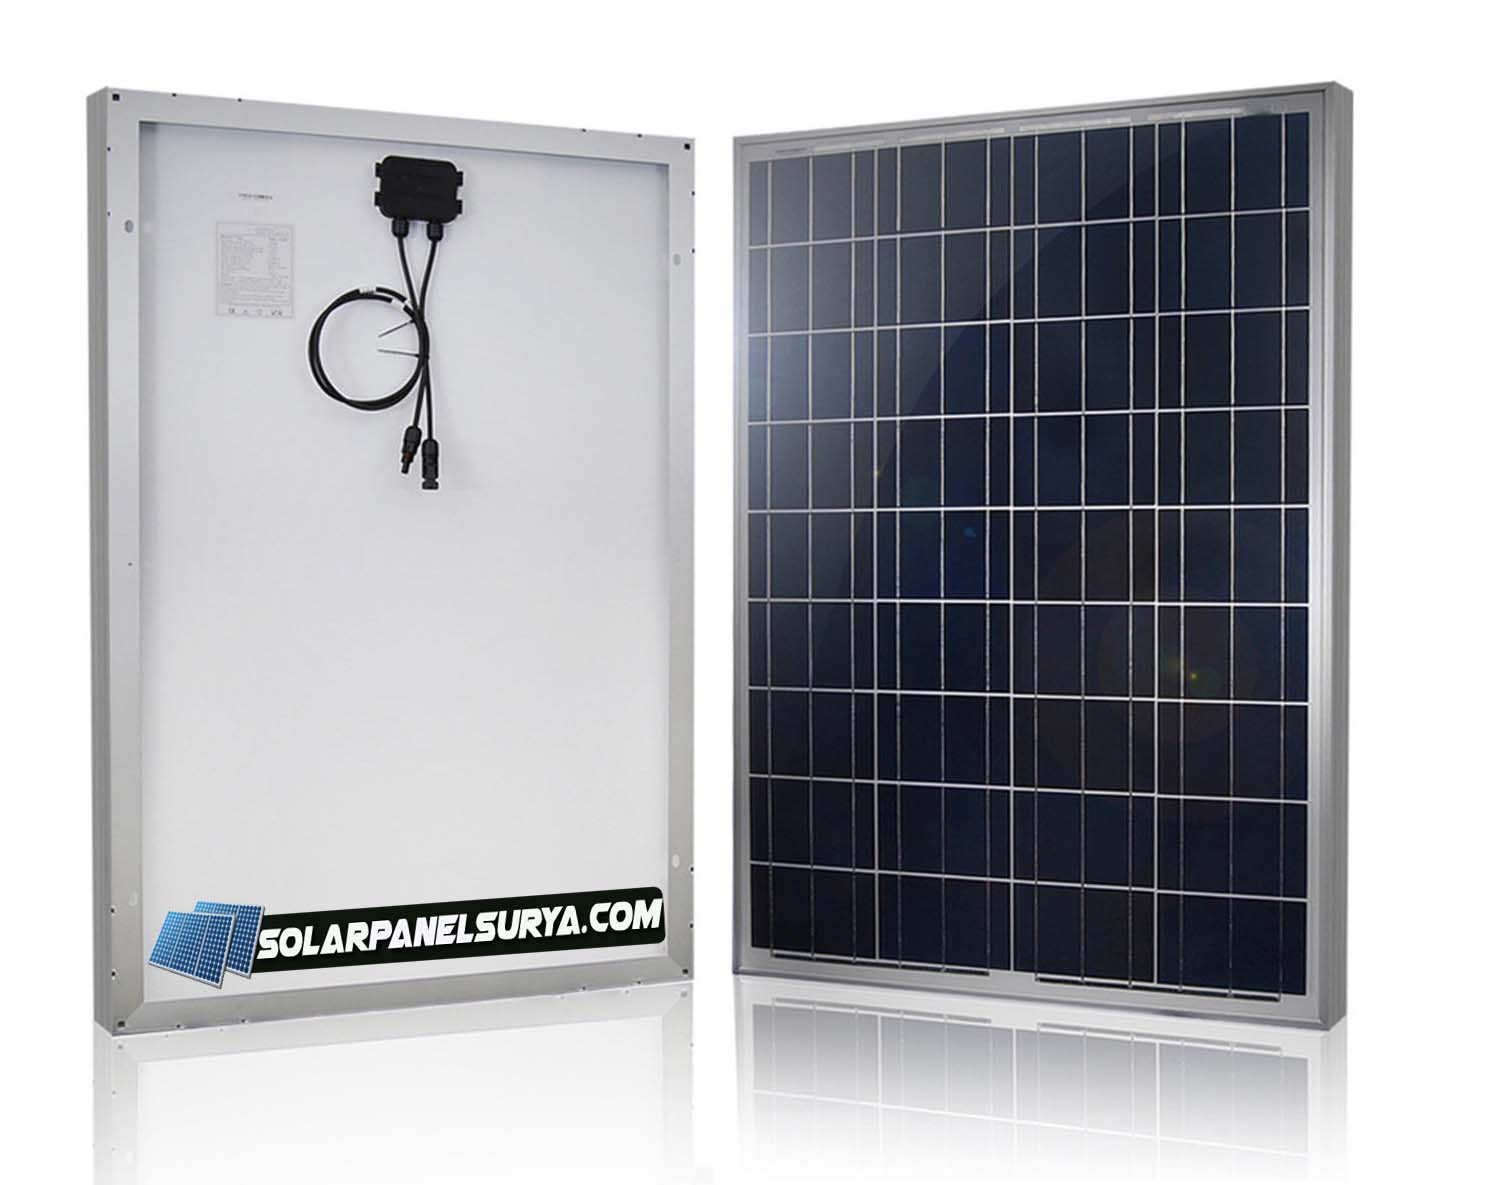 Solarcell Panel Surya 100watt Solar Panel Surya Harga